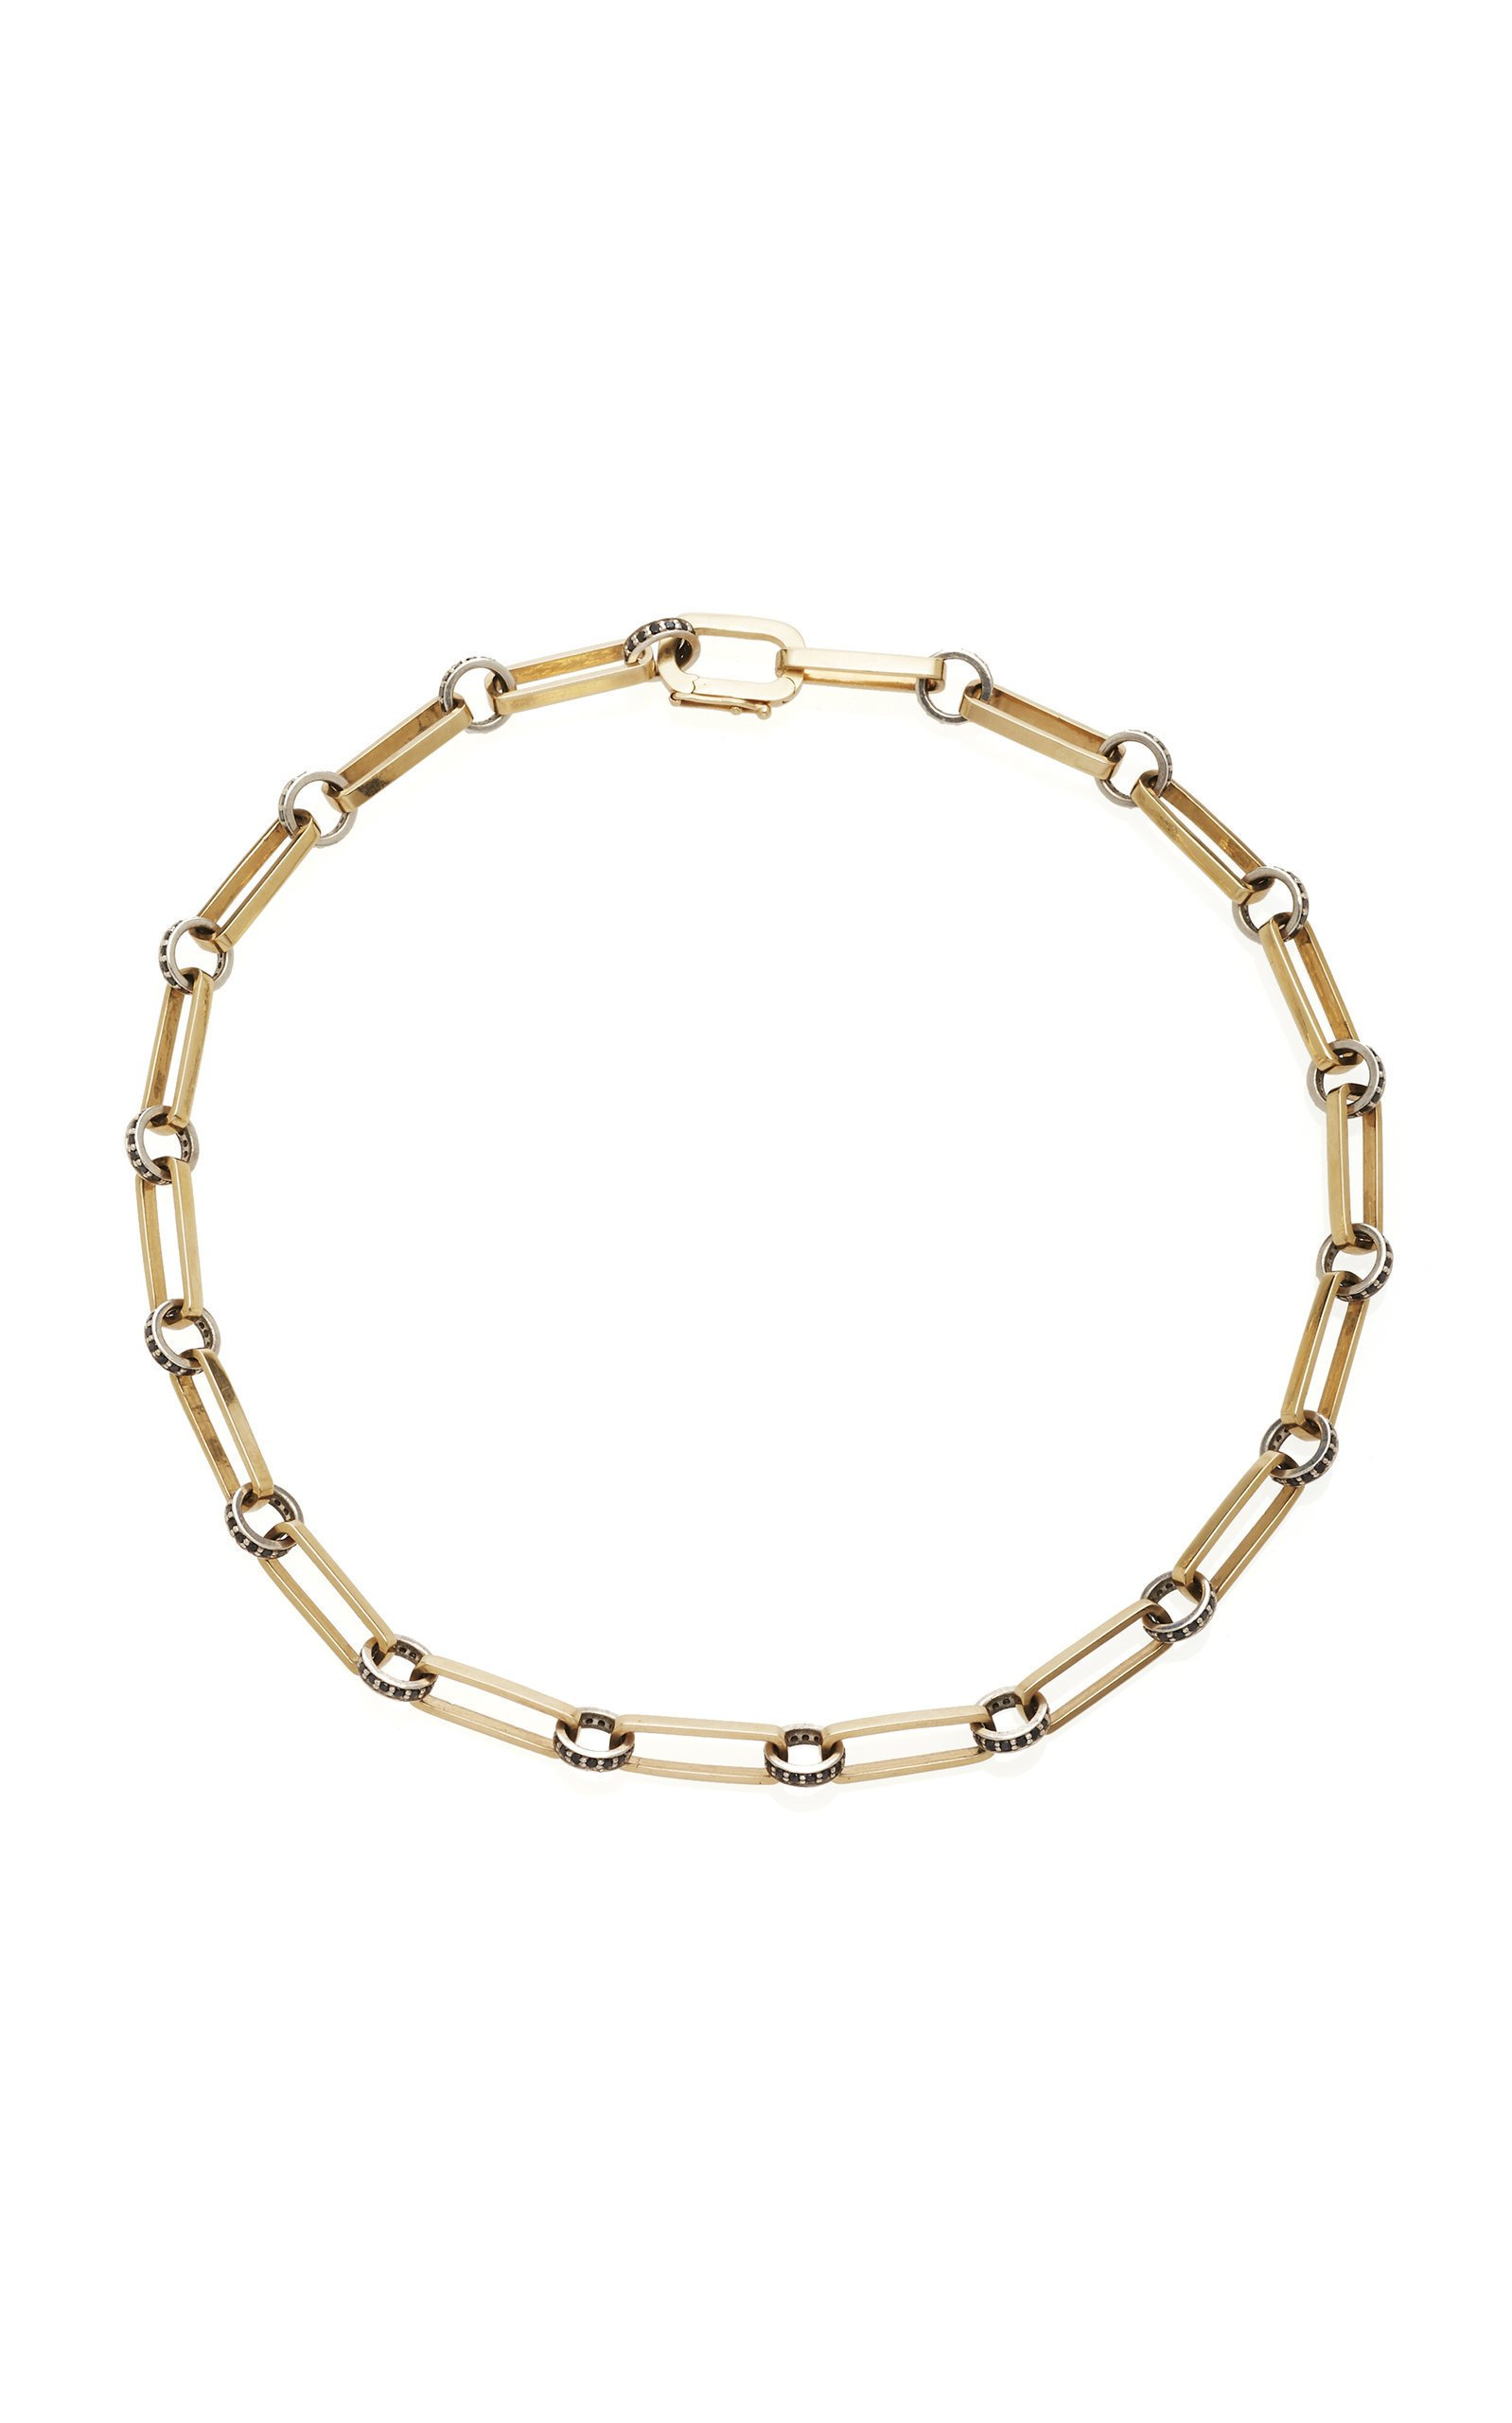 Nancy Newberg Smooth elongated oval link necklace